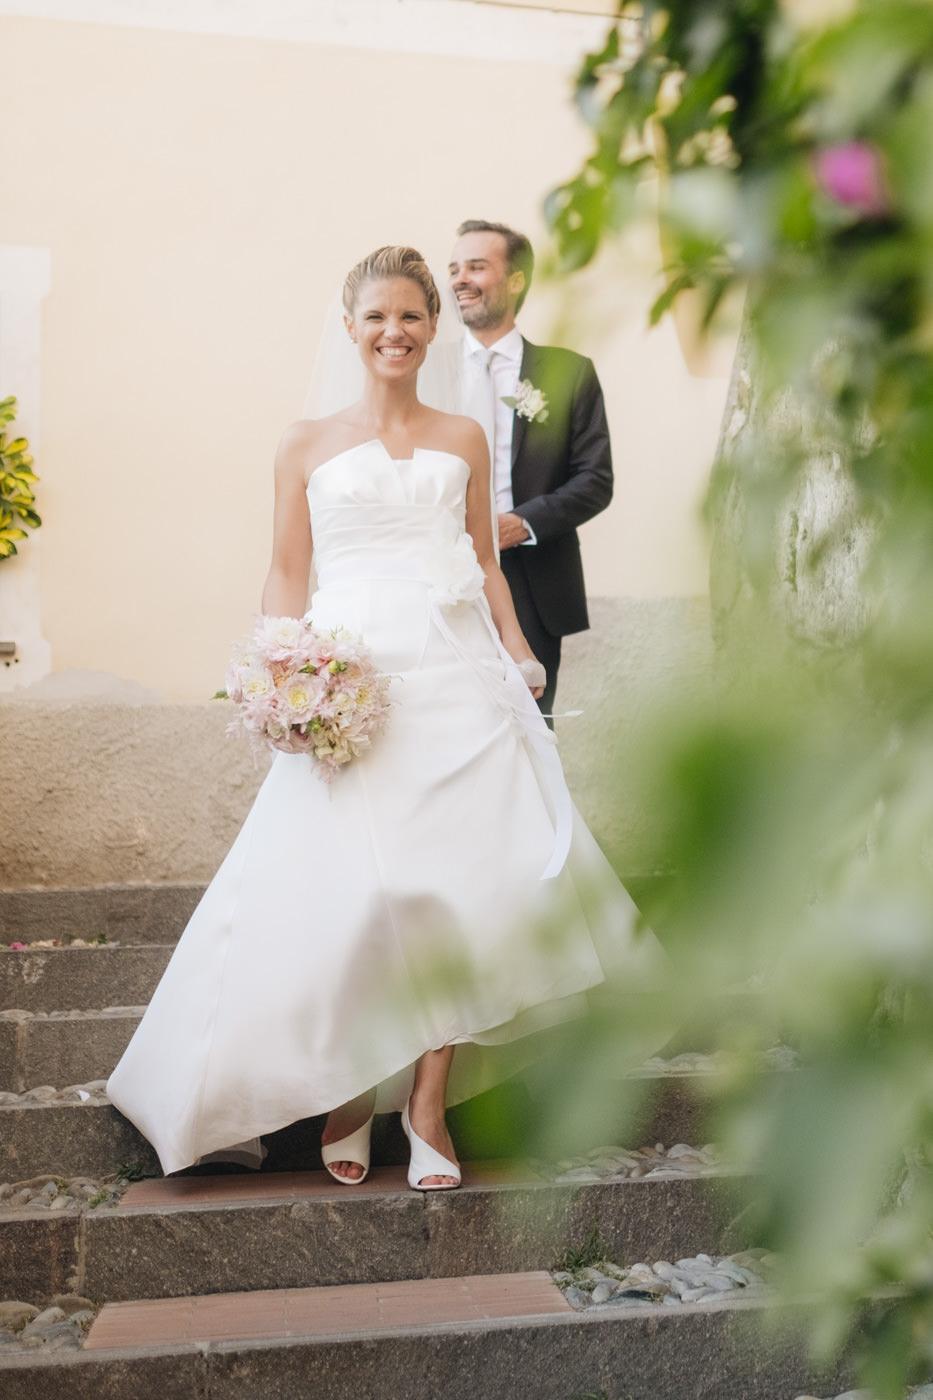 matrimoni_all_italiana_fotografo_matrimonio_cinque_terre-49.jpg